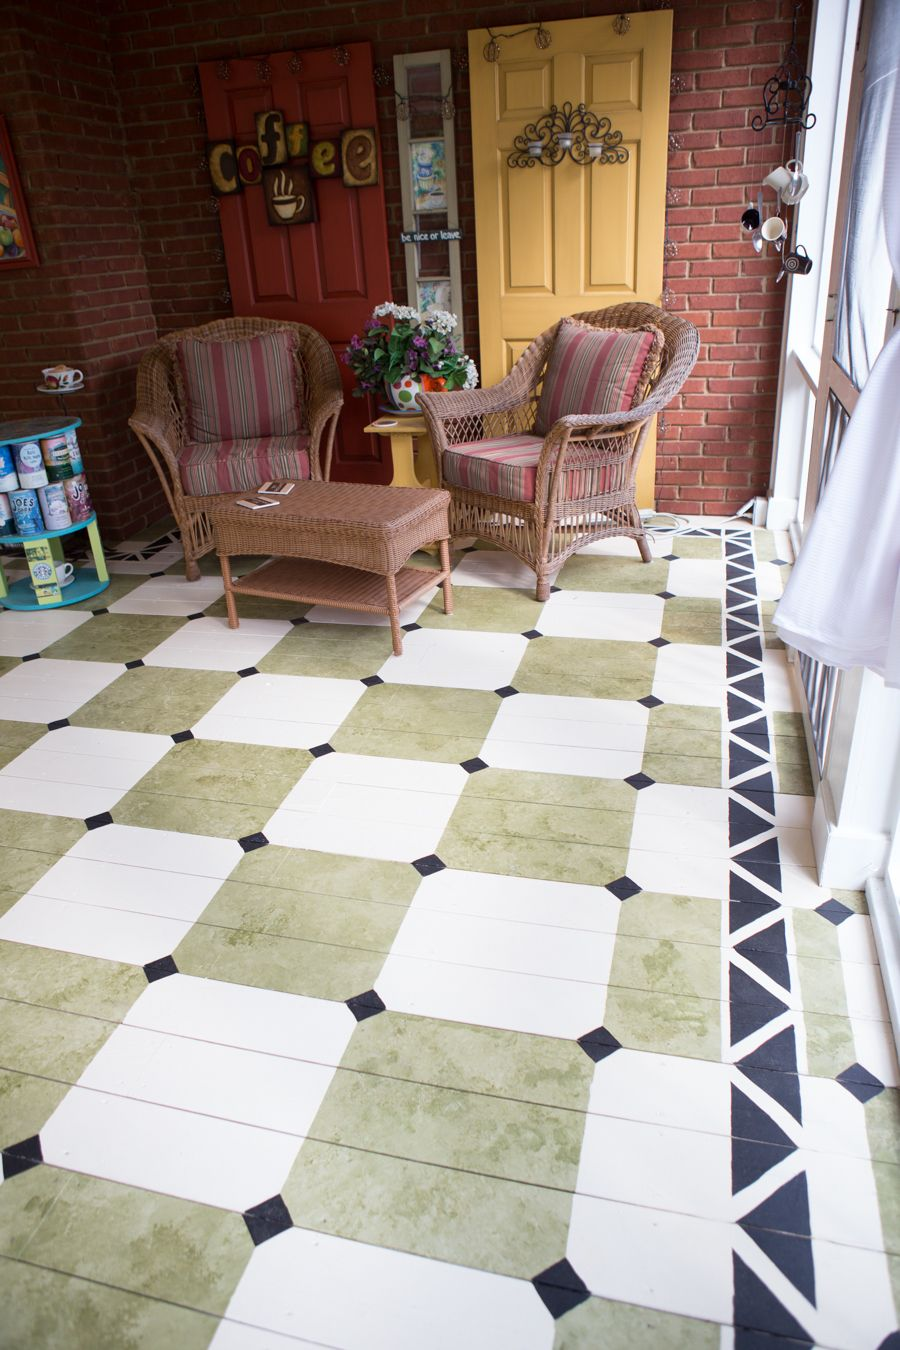 Painted porch floor! So cute! Painting tile floors